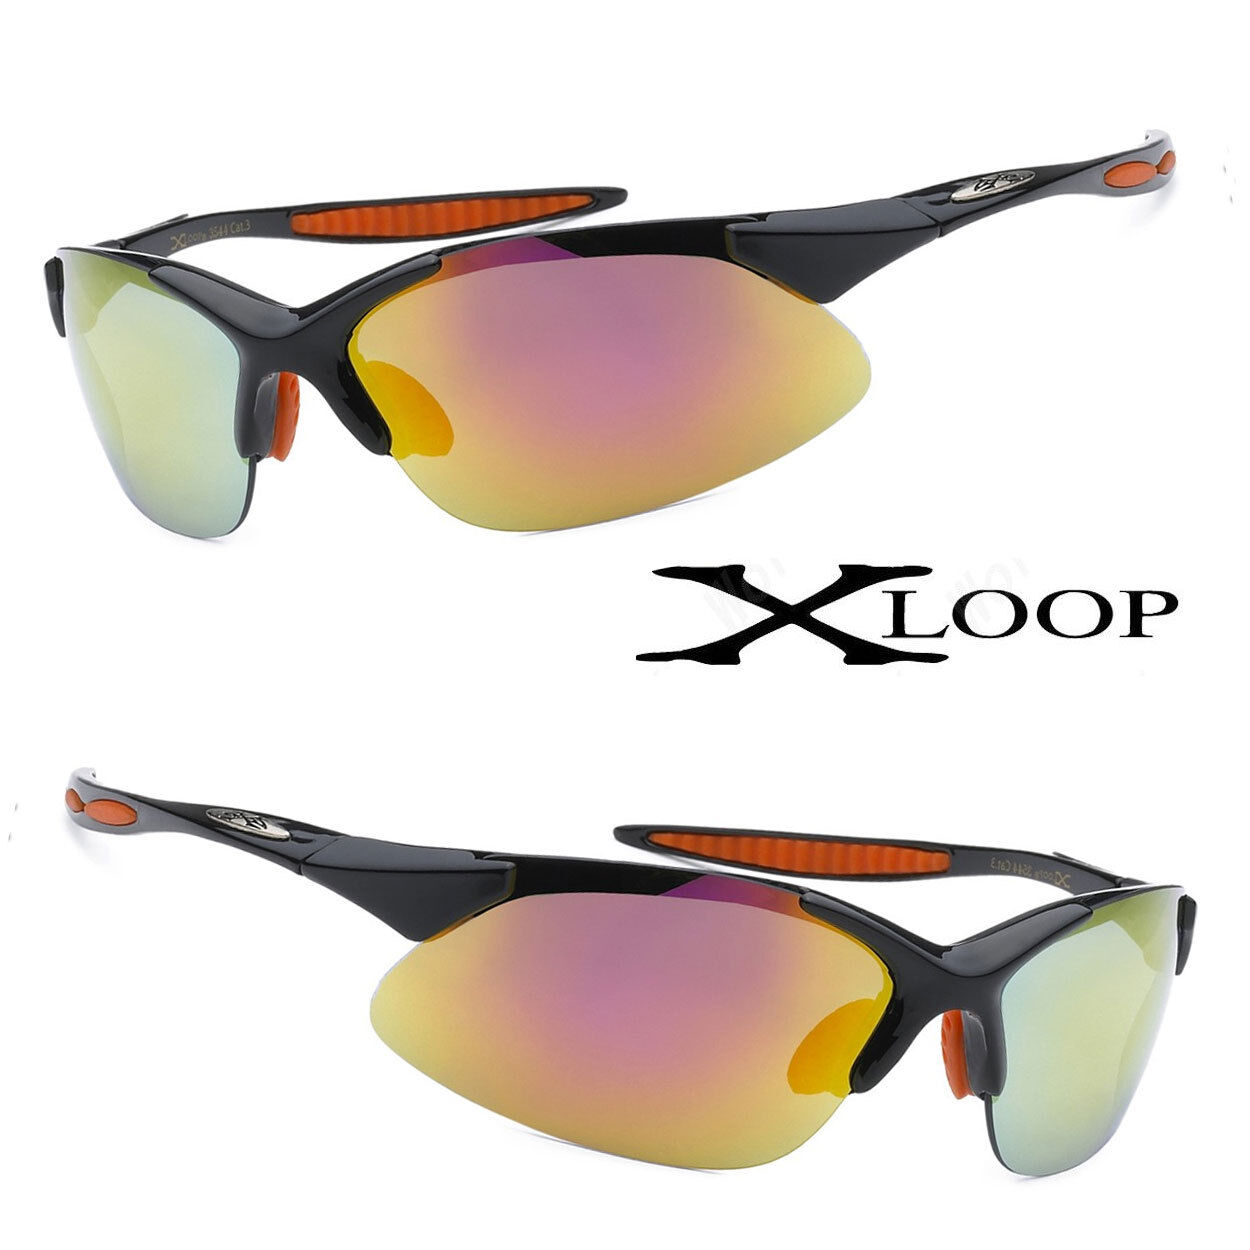 8459eaa5de Details about XLoop Mens Womens Sports Designer Sunglasses Semi Rimless  UV400 Black Frame Fire